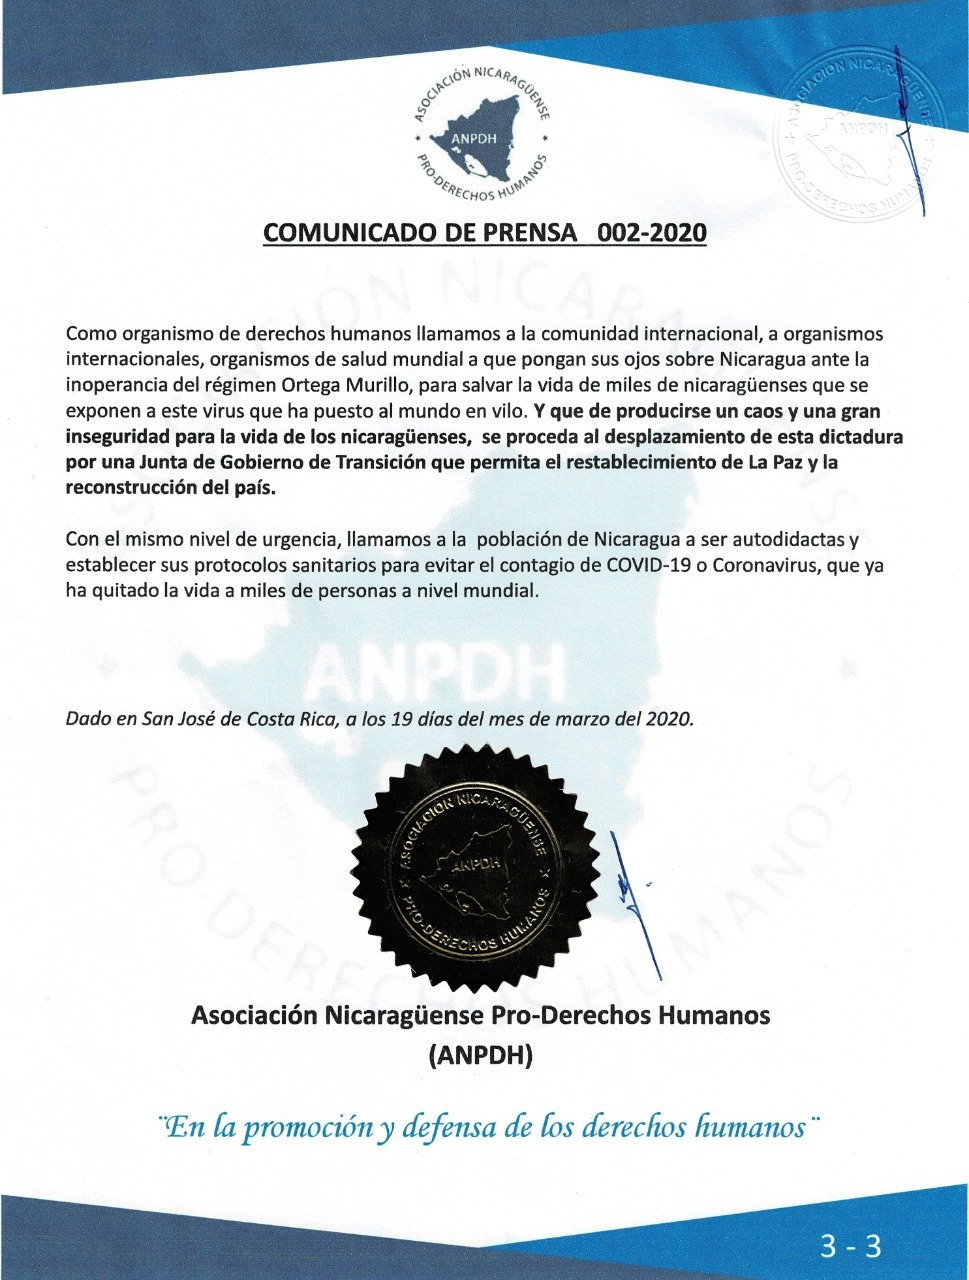 COMUNICADO-DE-PRENSA-02-2020-03.jpg